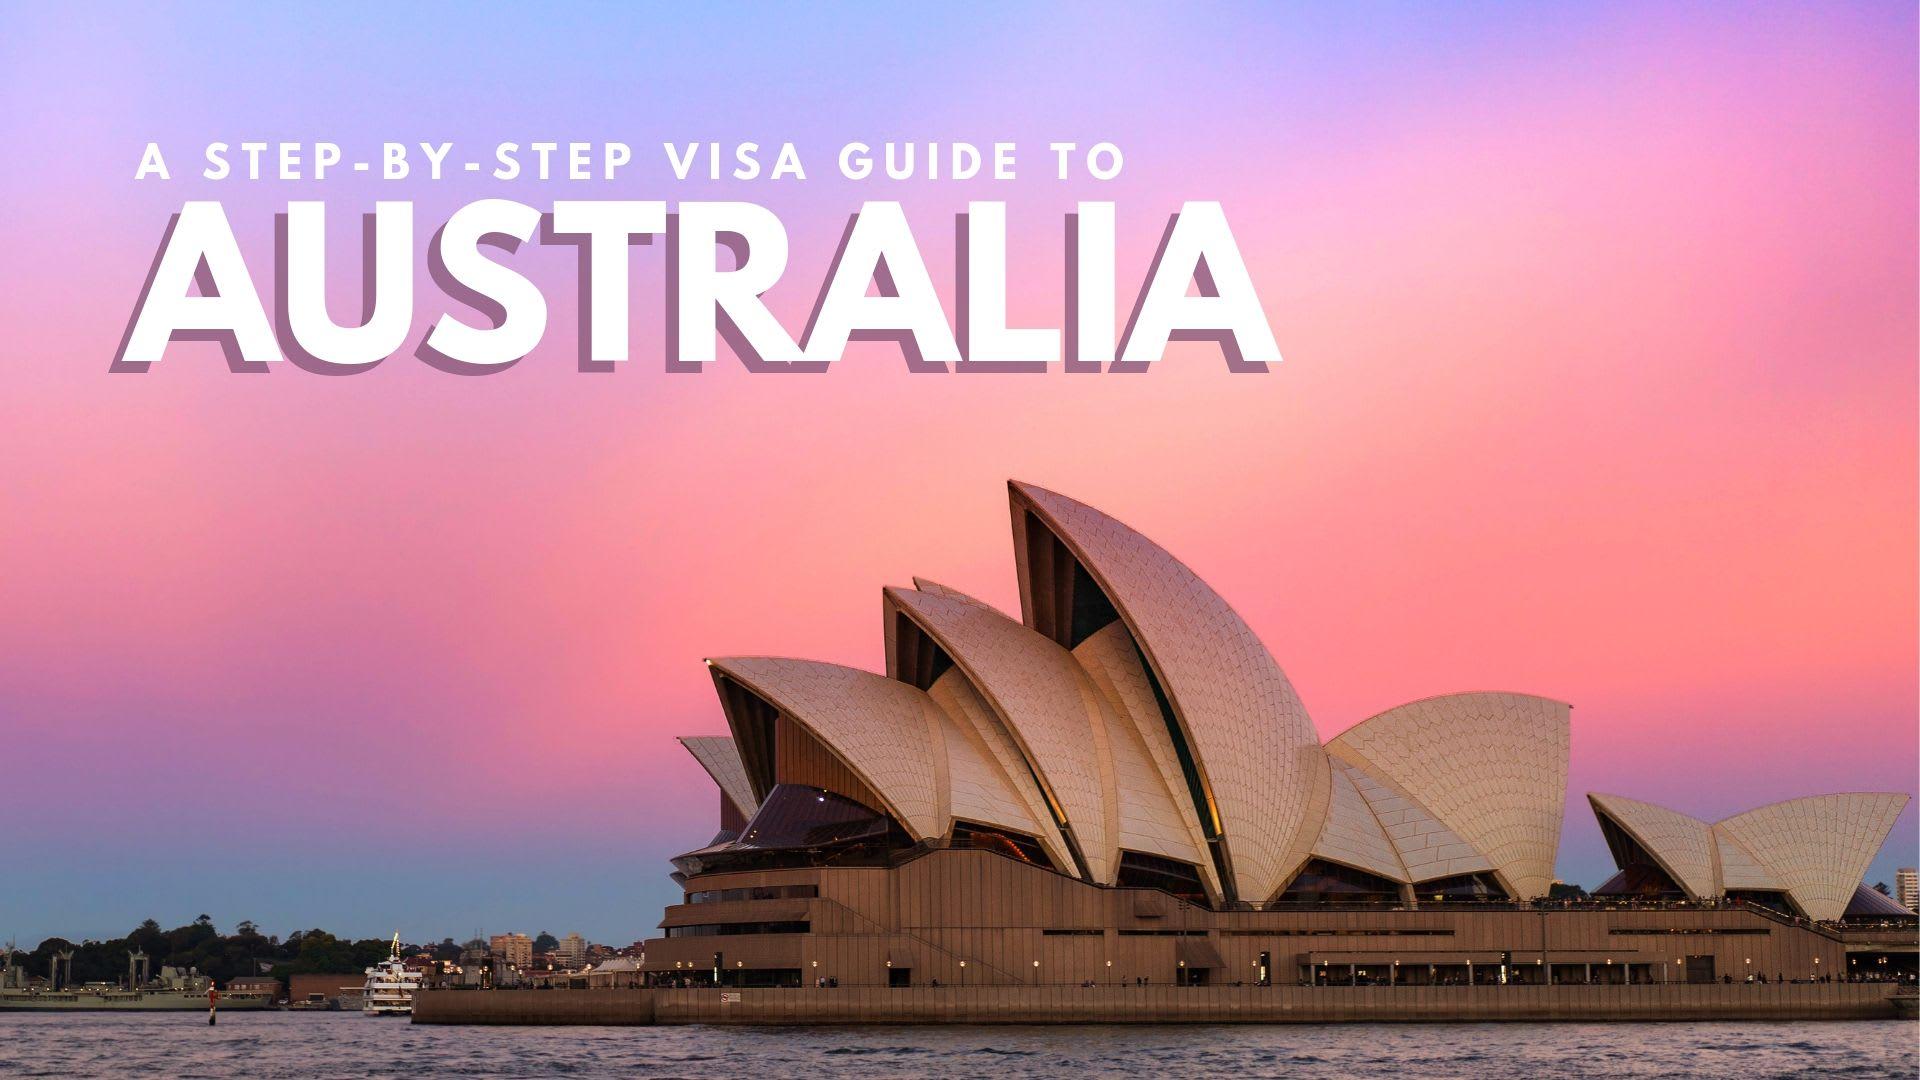 australia visa guide